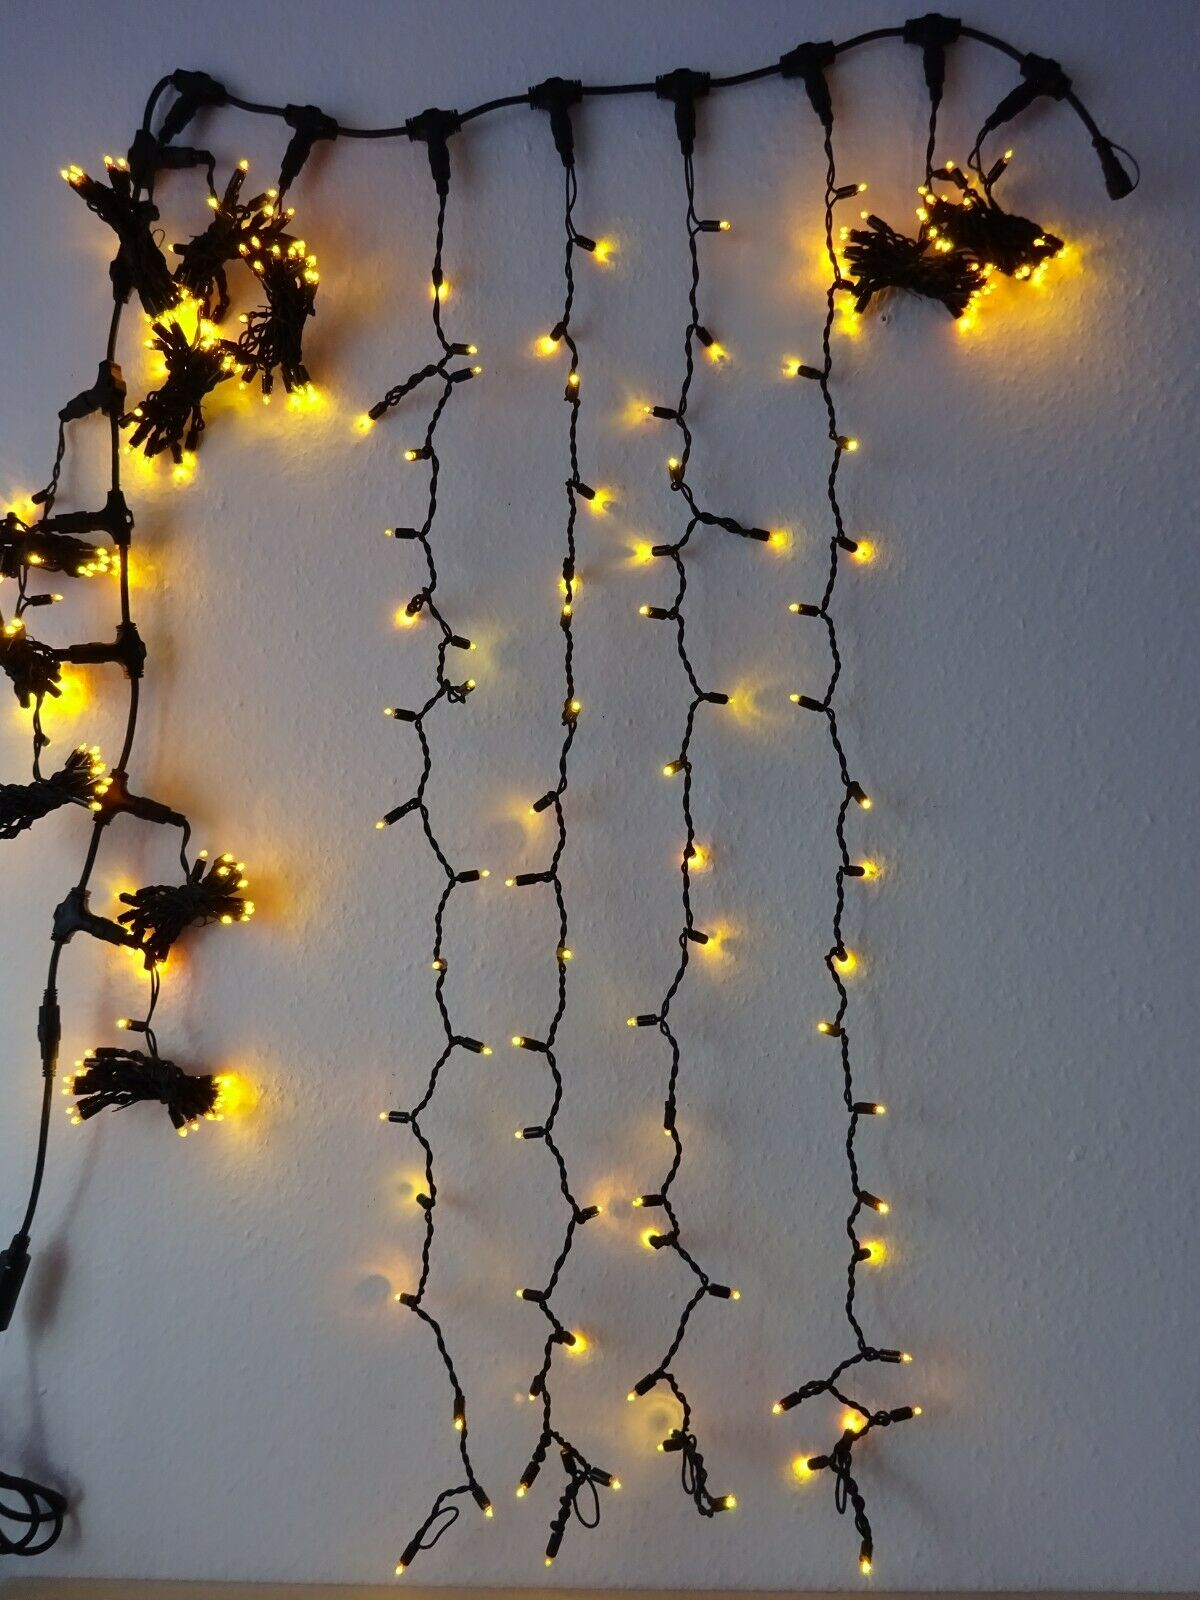 Endres LED Lichtervorhang 2 x 2m + Erweiterung 2 x 2m Gelb System E42210+E42211